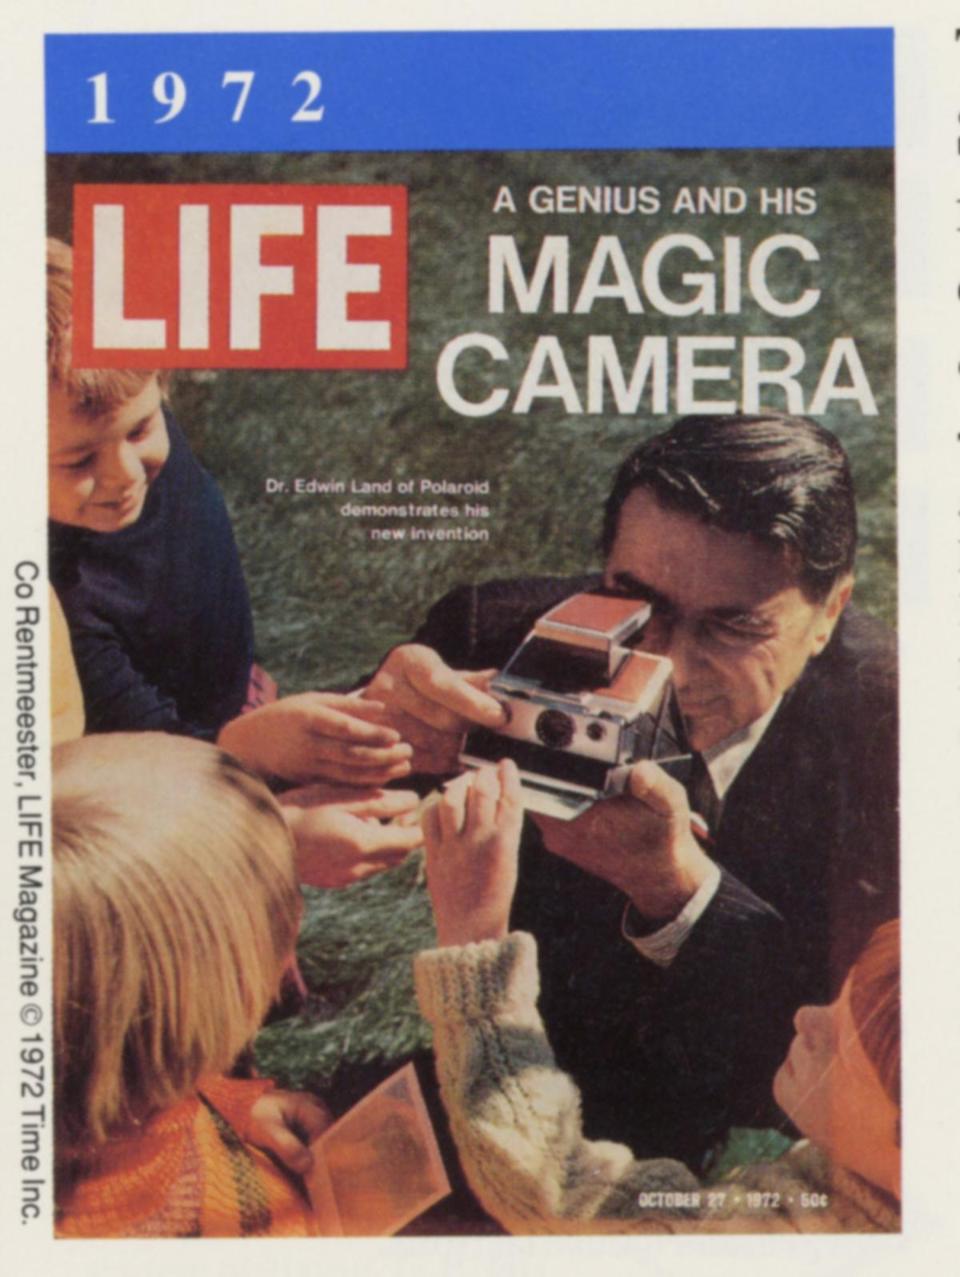 Photos polaroid changed picture taking habits of millions photo color advance life magazine cover 1972 polaroid sx 70 single sciox Choice Image